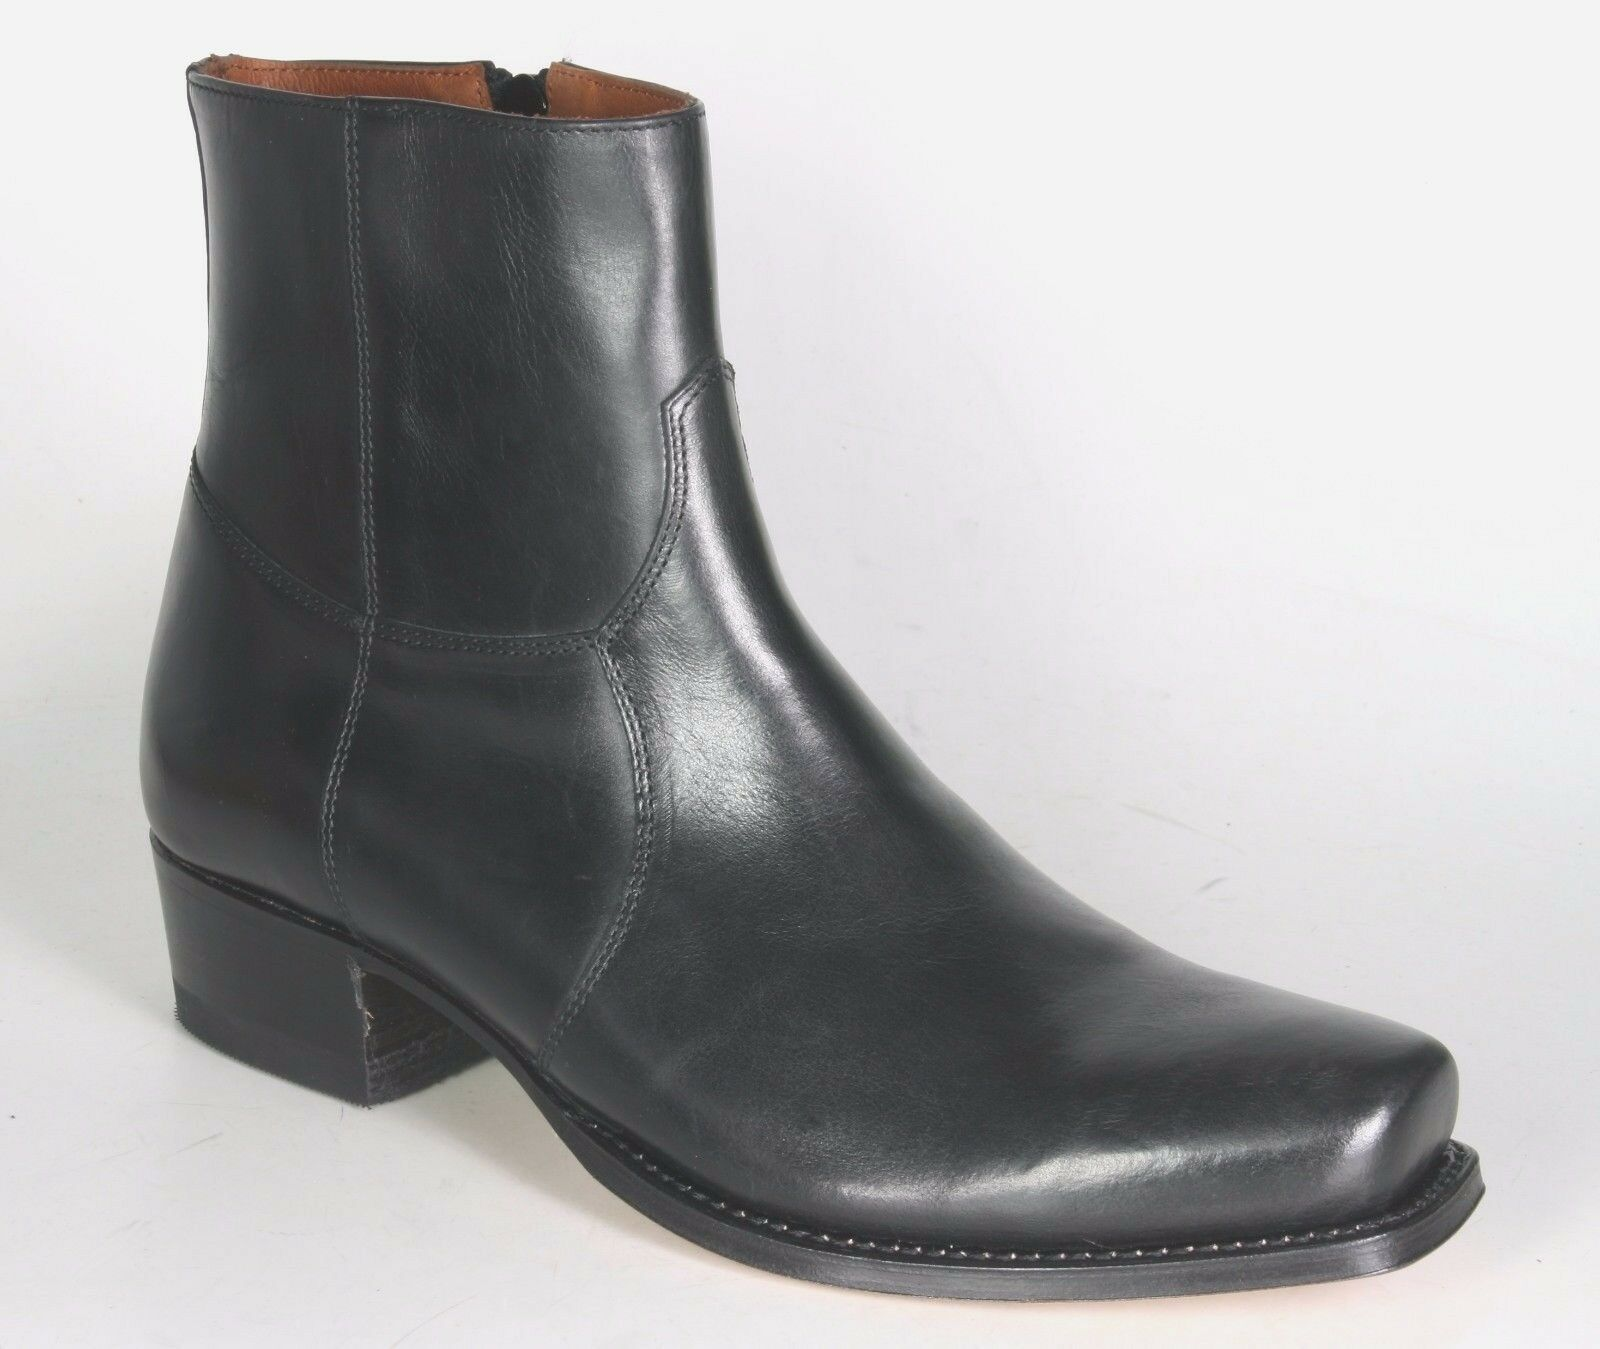 5200 Sendra Stiefelette INSA Rahmengenähte Ciclon Negro Schwarz Rahmengenähte INSA Schuhe aa6205